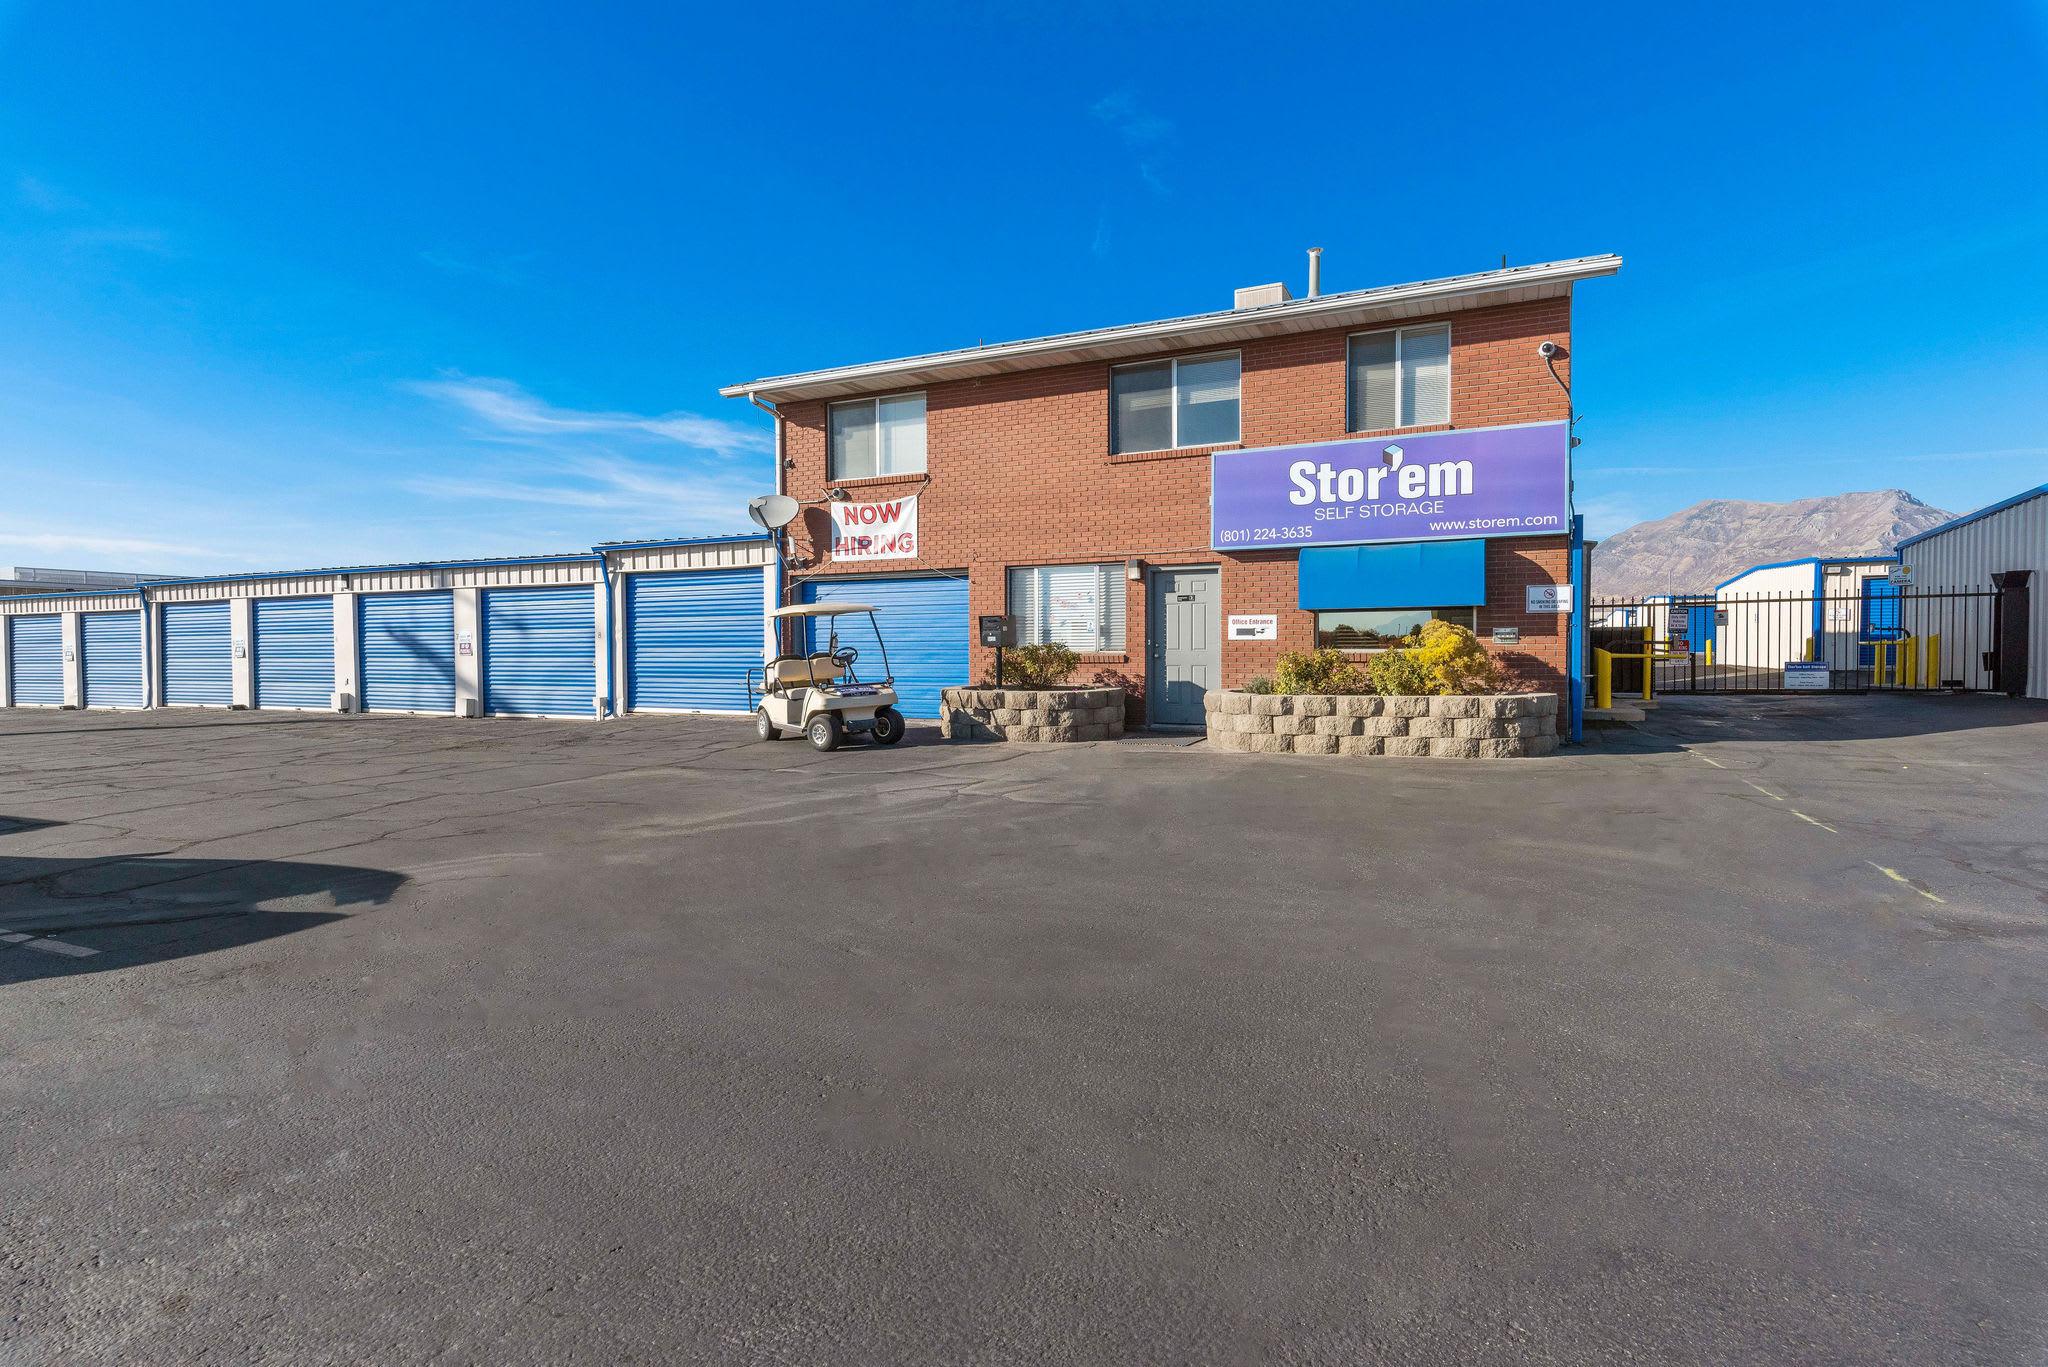 The front of the building at Stor'em Self Storage in Orem, Utah